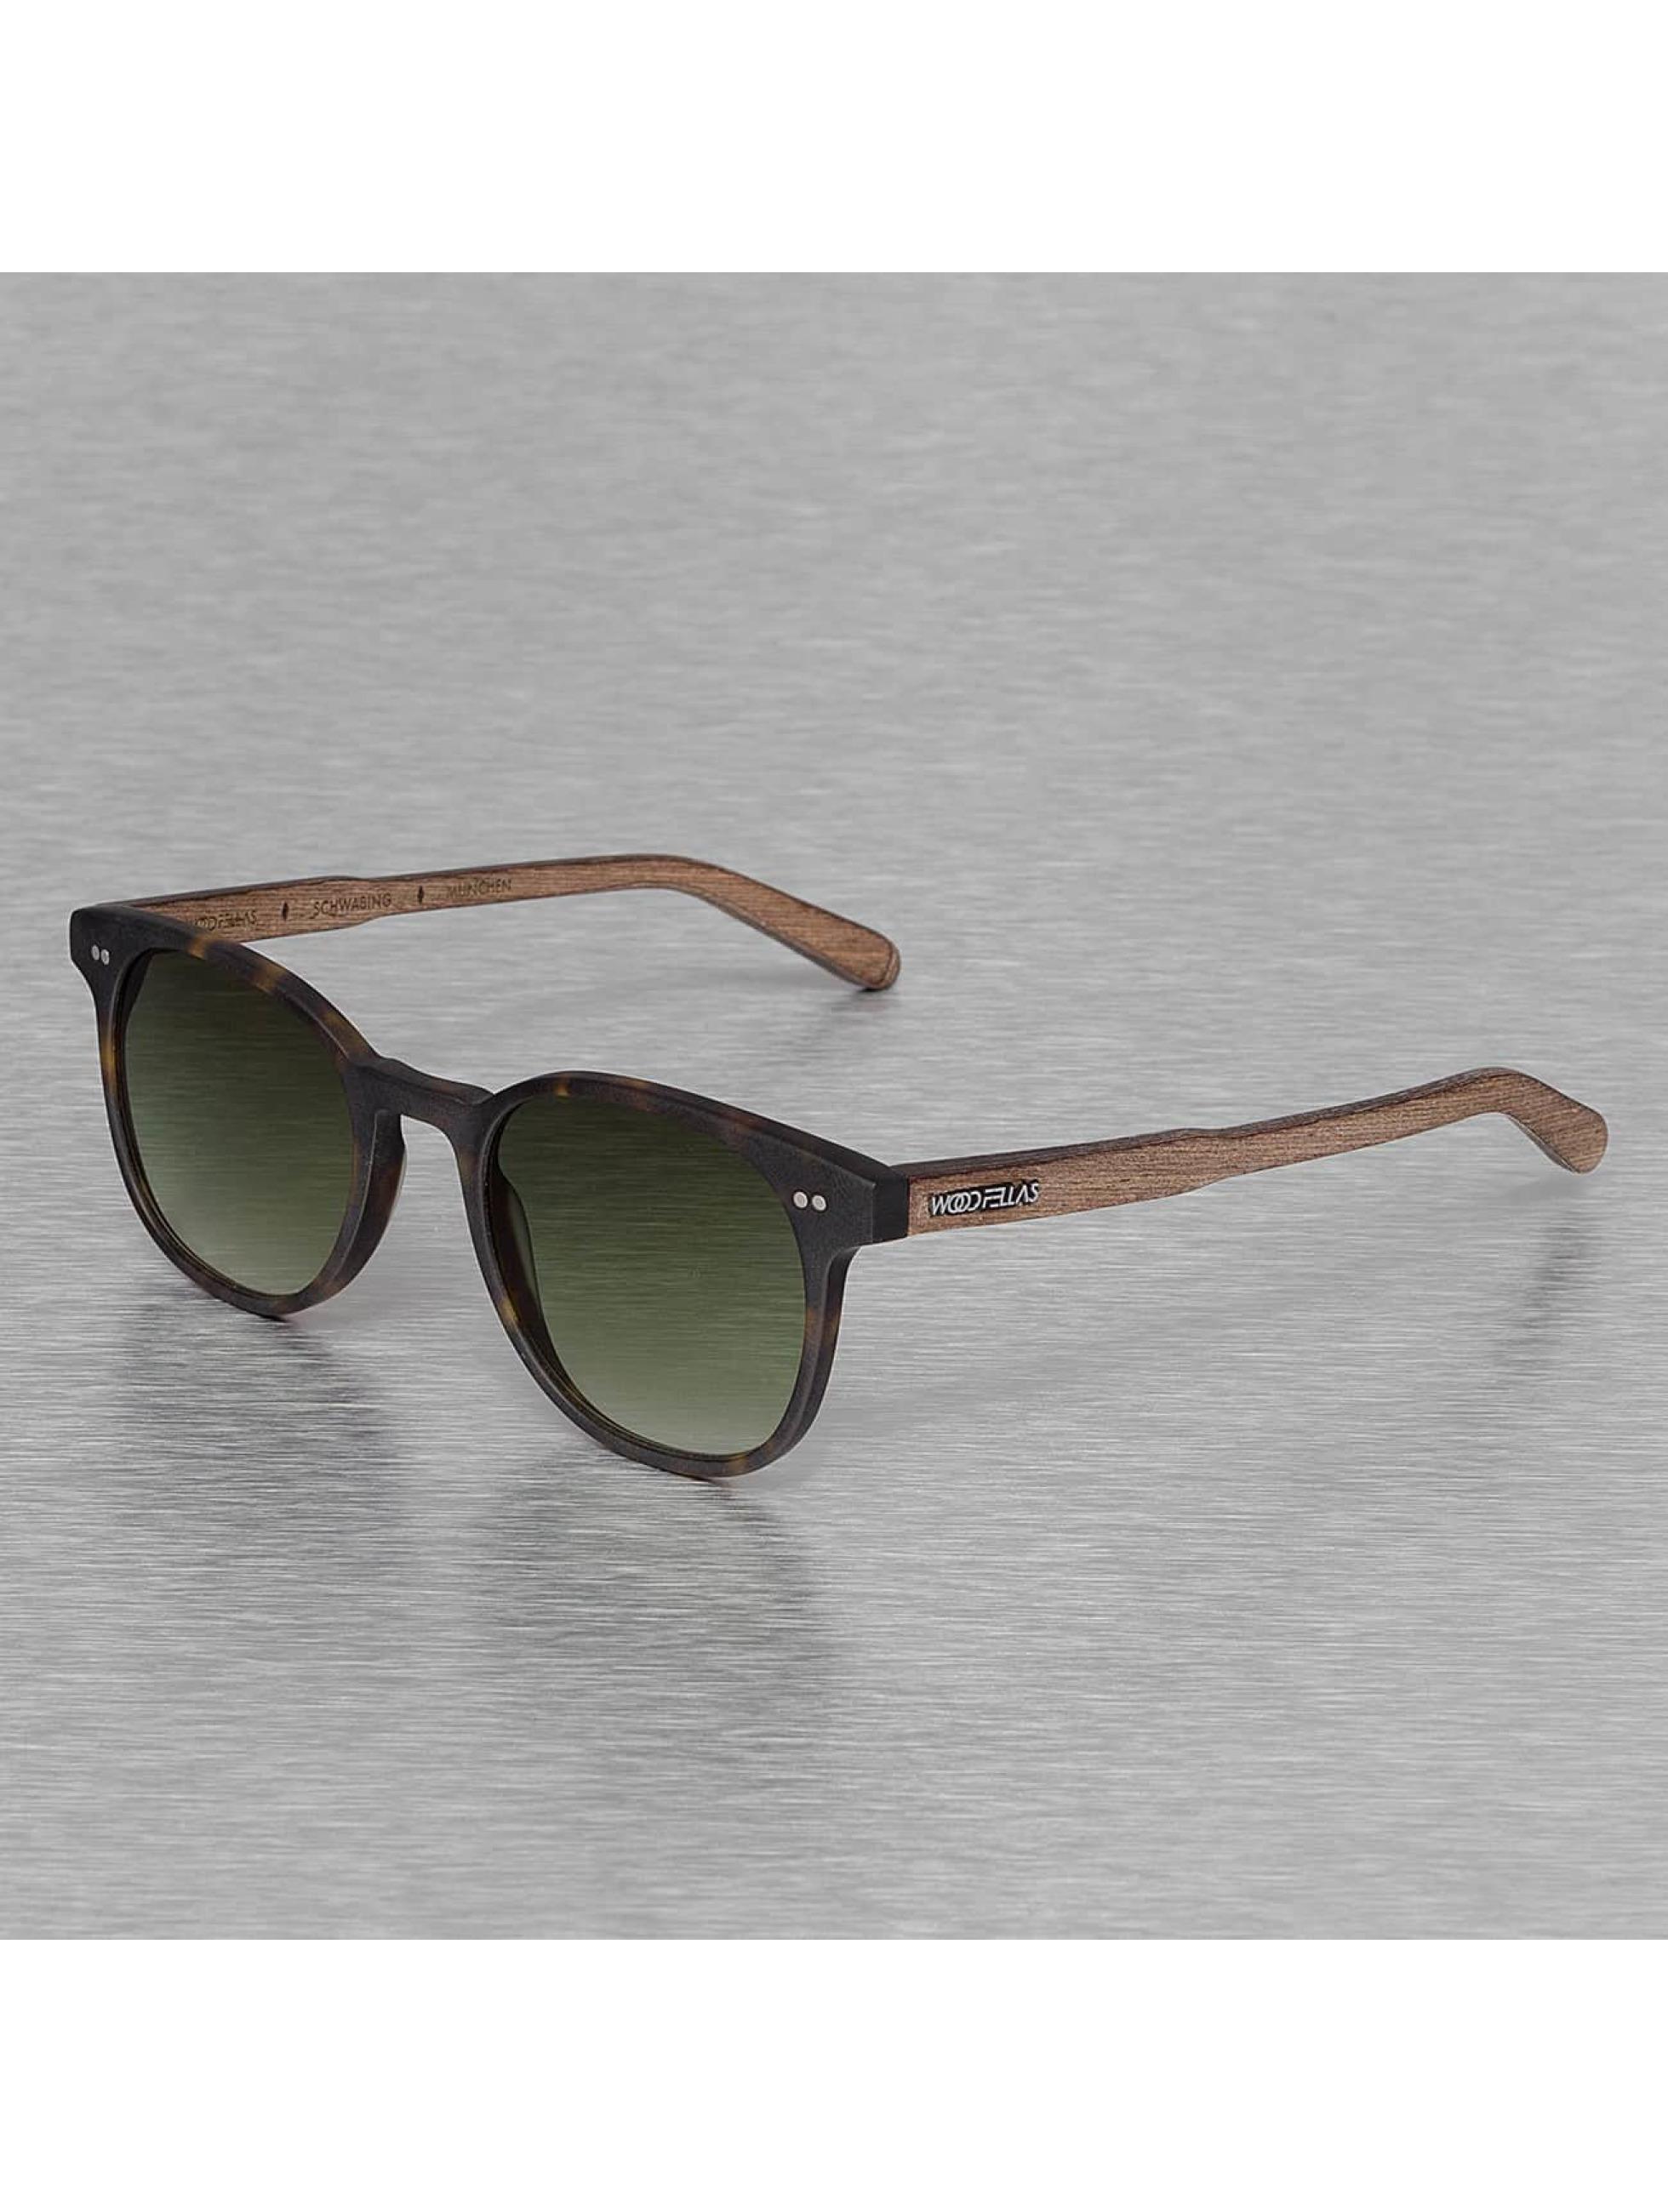 Wood Fellas Eyewear Zonnebril Eyewear Schwabing Polarized Mirror bruin